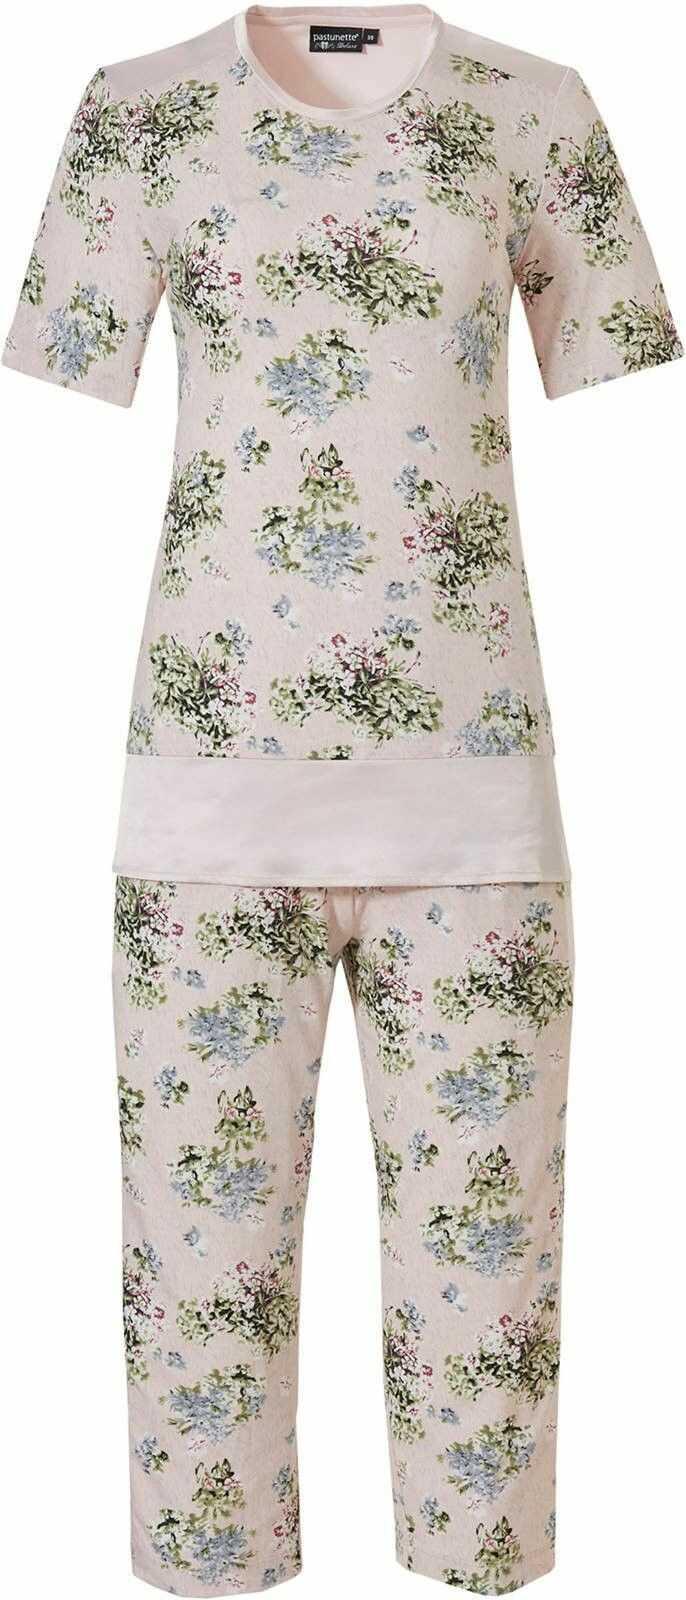 Pastunette Deluxe Millefleur piżama 25211-300-2 kolor 203